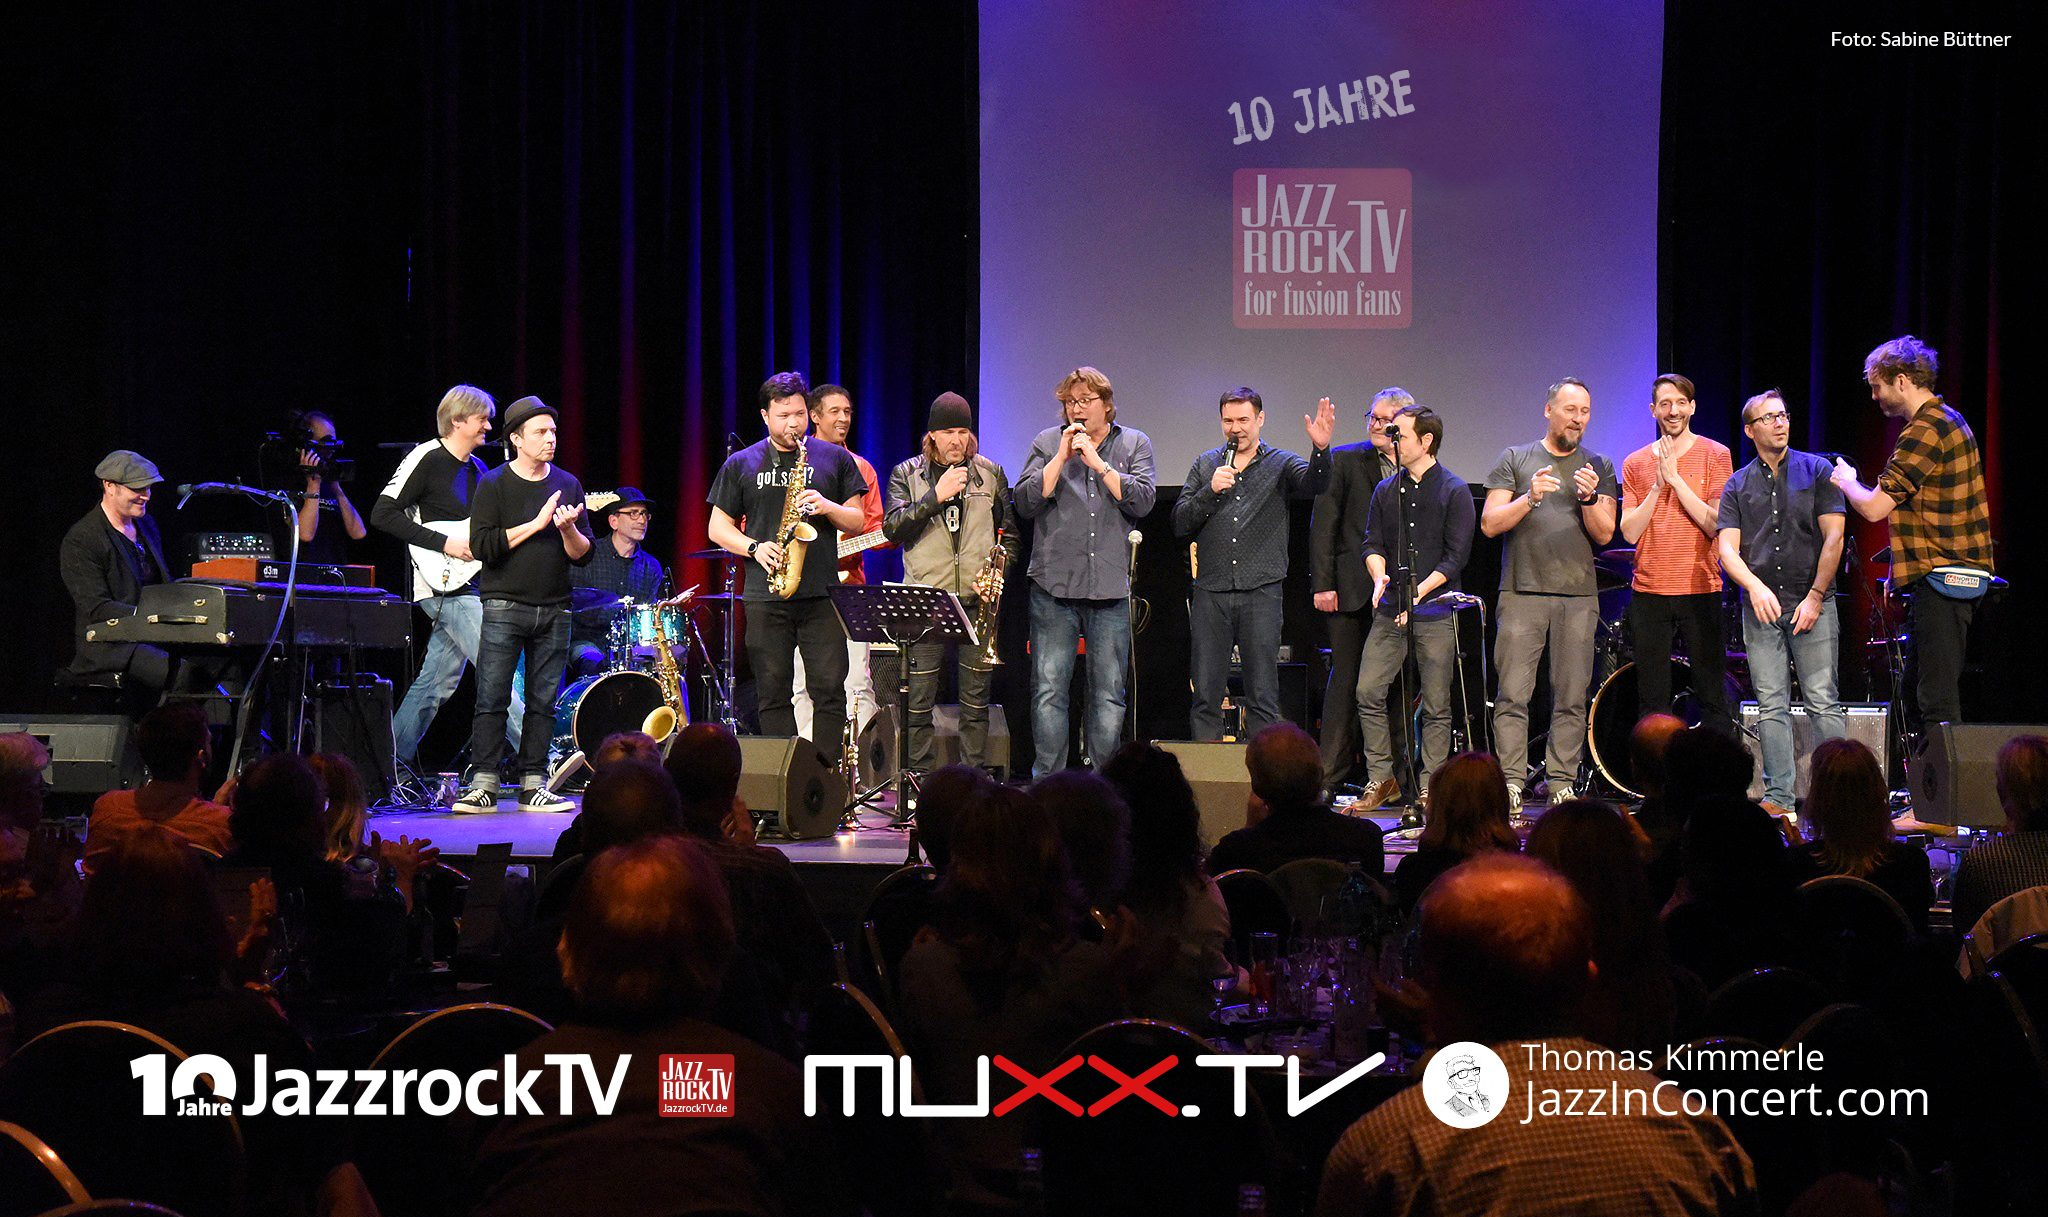 10 Jahre JazzrockTV LIVE SHOW